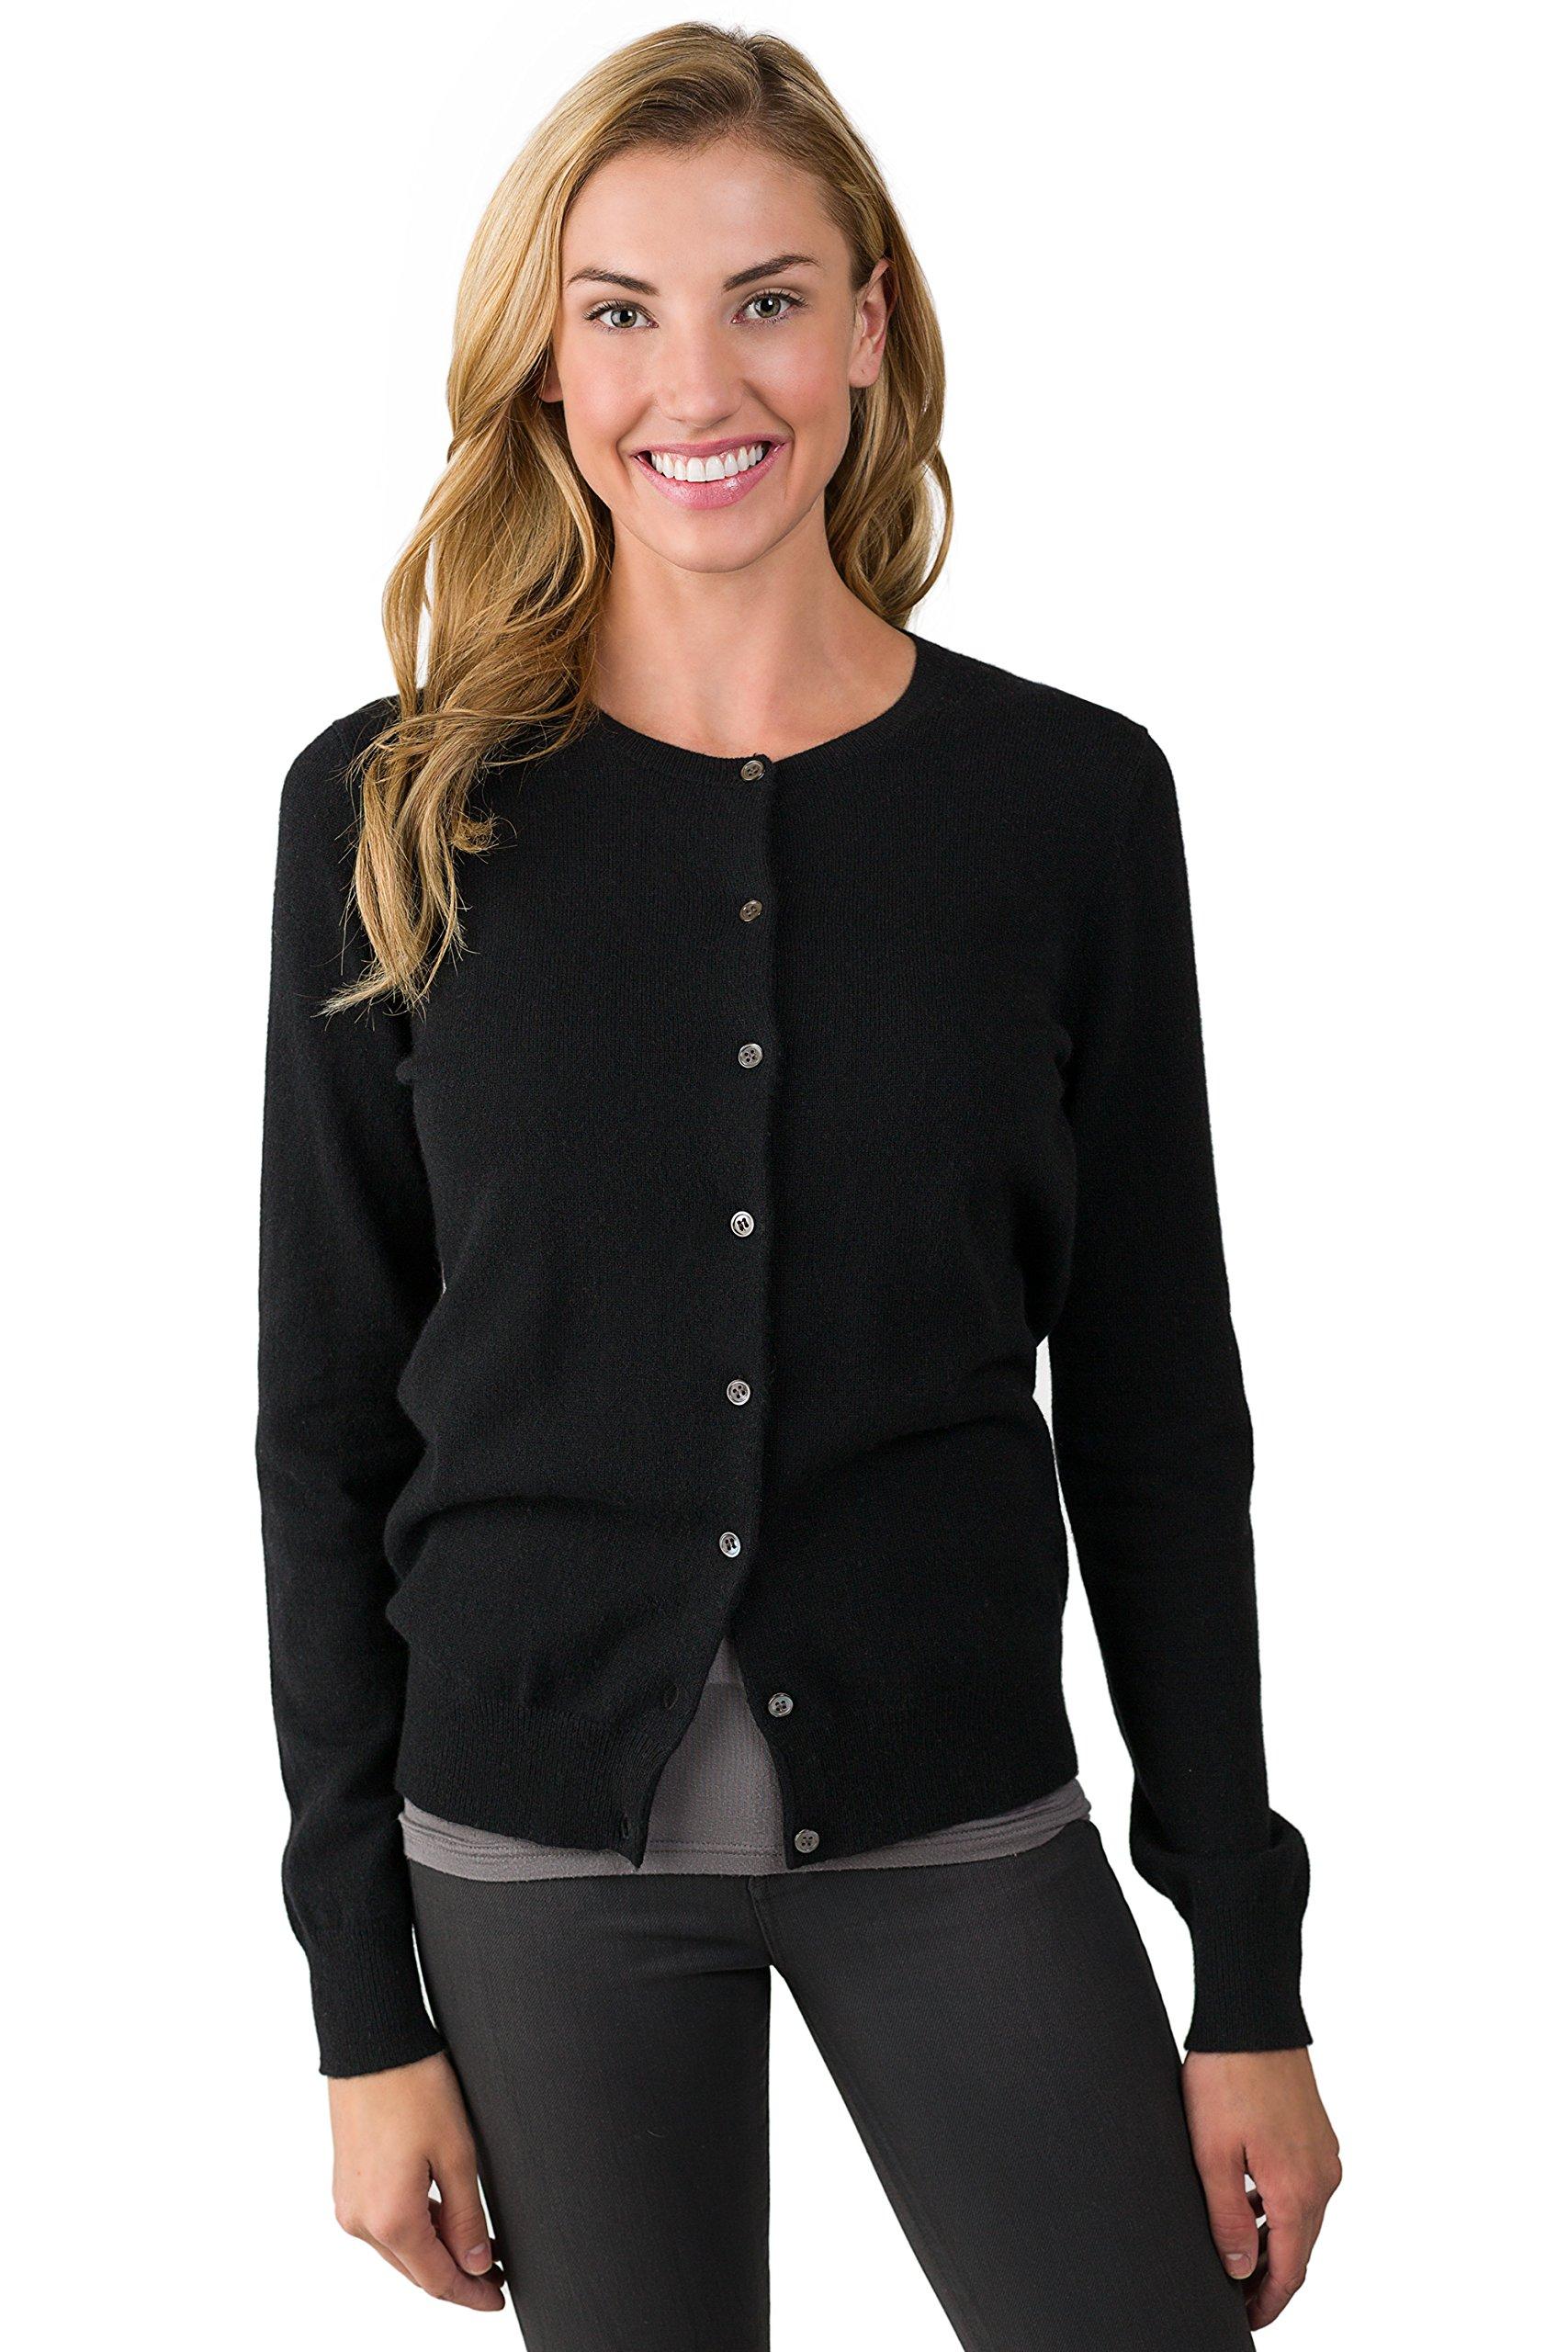 JENNIE LIU Women's 100% Cashmere Button Front Long Sleeve Crewneck Cardigan Sweater (M, BLACK)